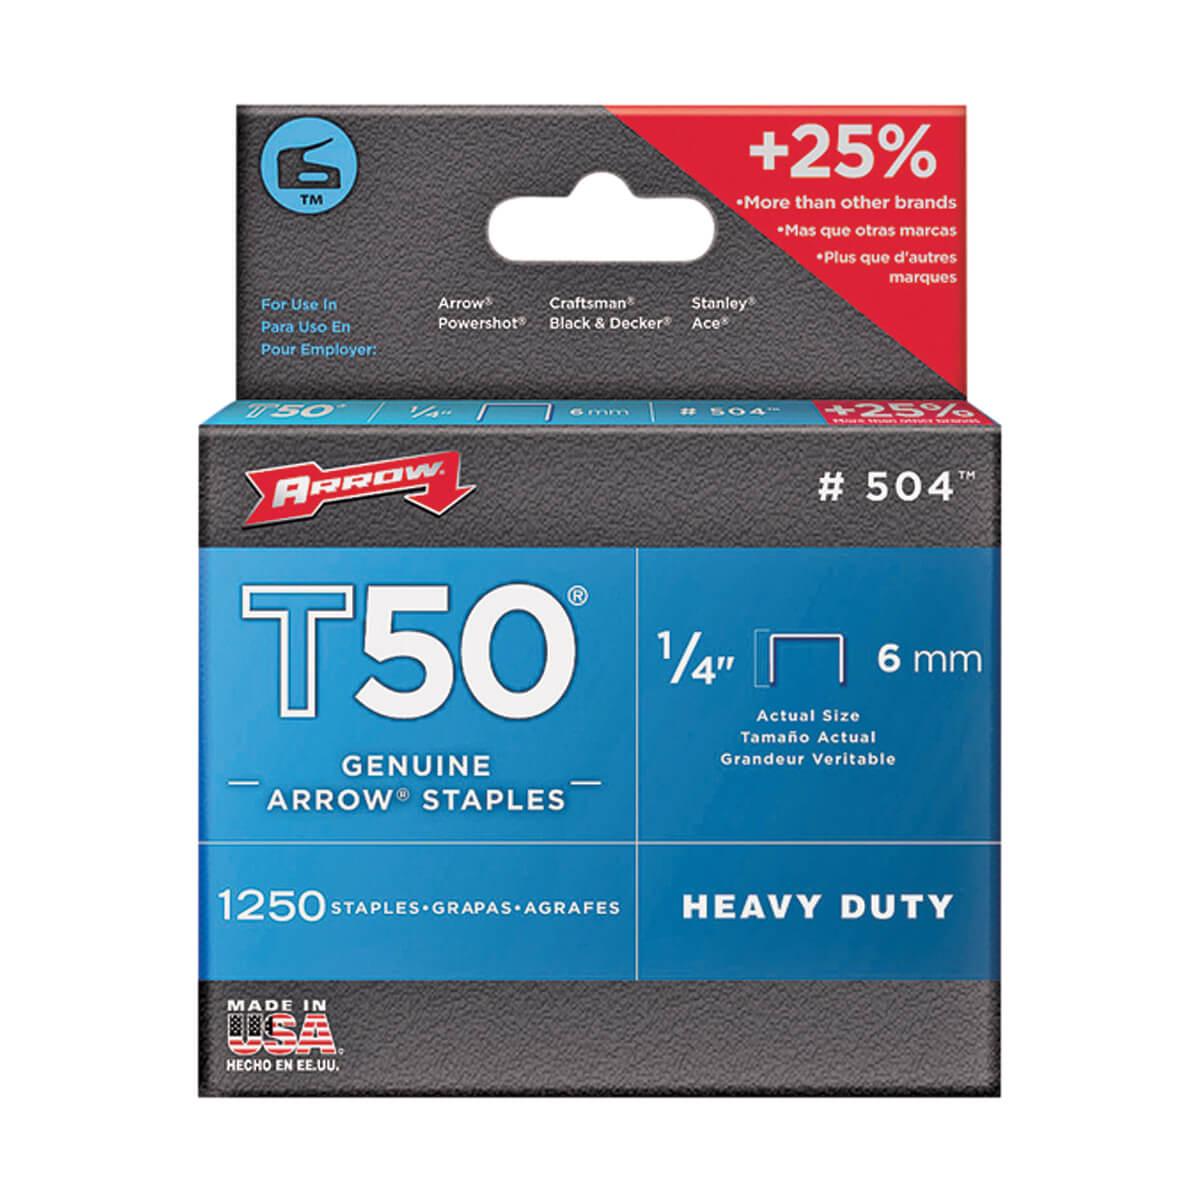 "T50 Heavy Duty Crown Staples, 1/4"" (box of 1250)"